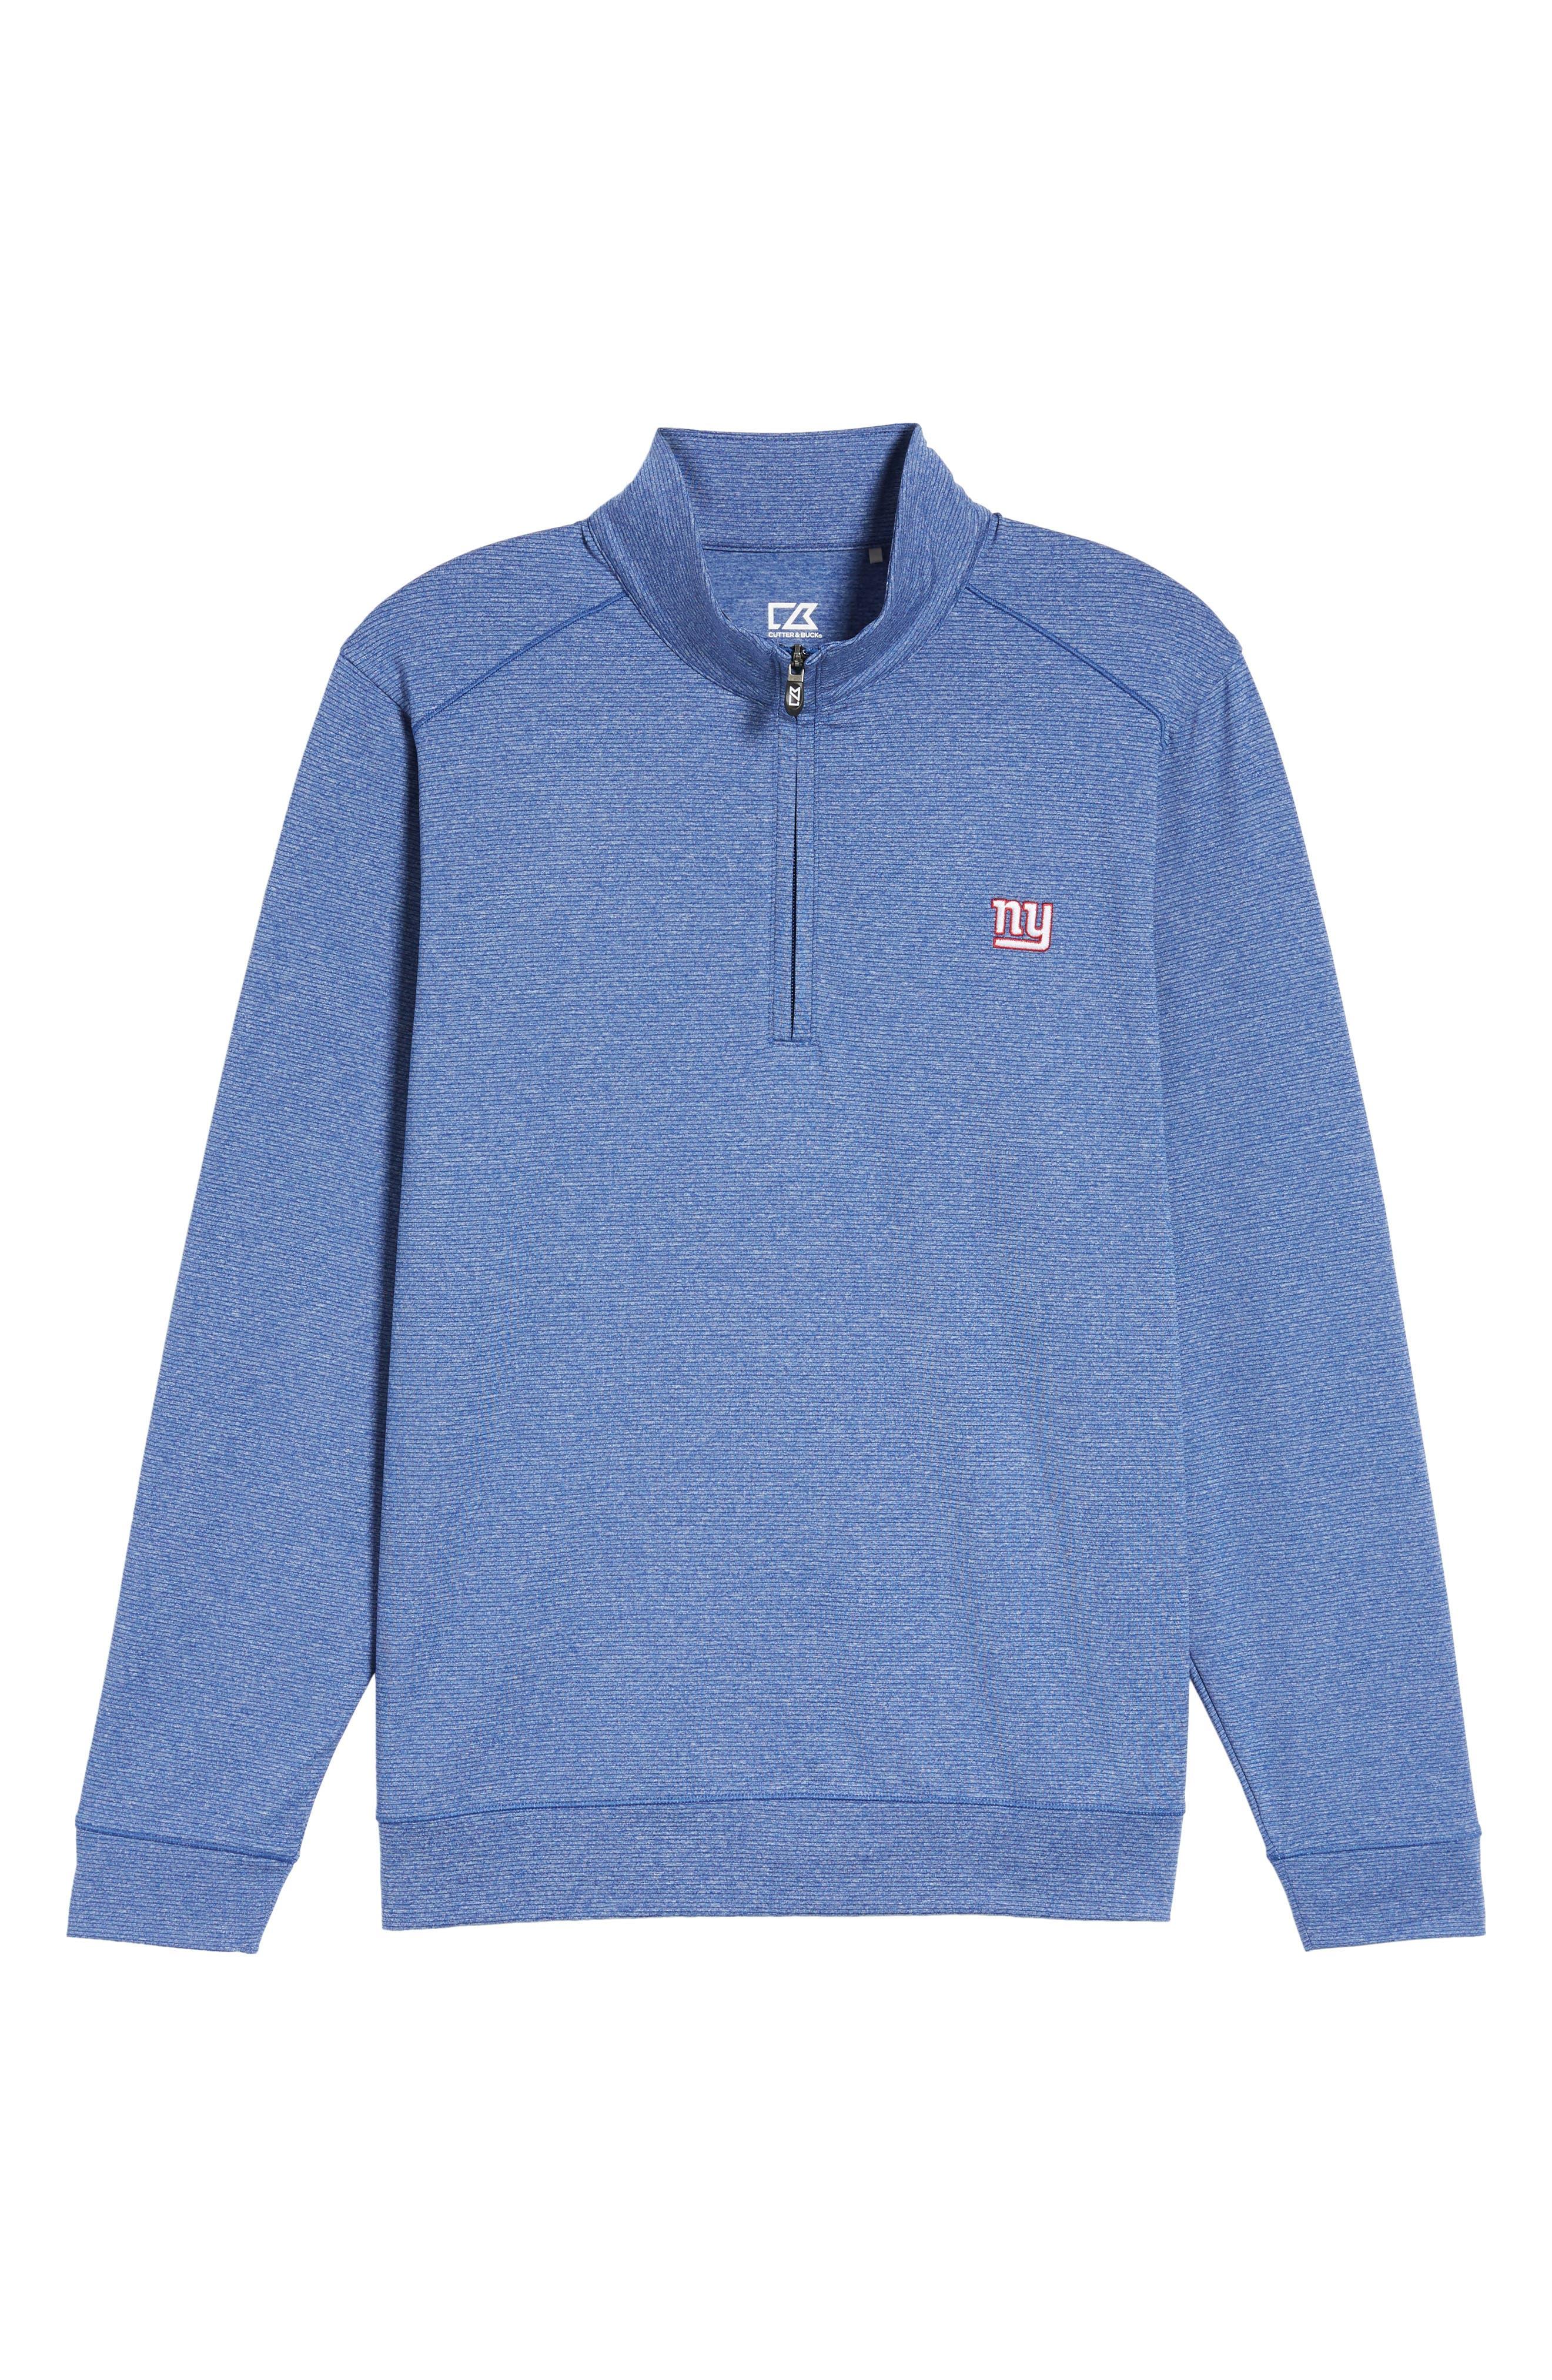 Shoreline - New York Giants Half Zip Pullover,                             Alternate thumbnail 6, color,                             Tour Blue Heather